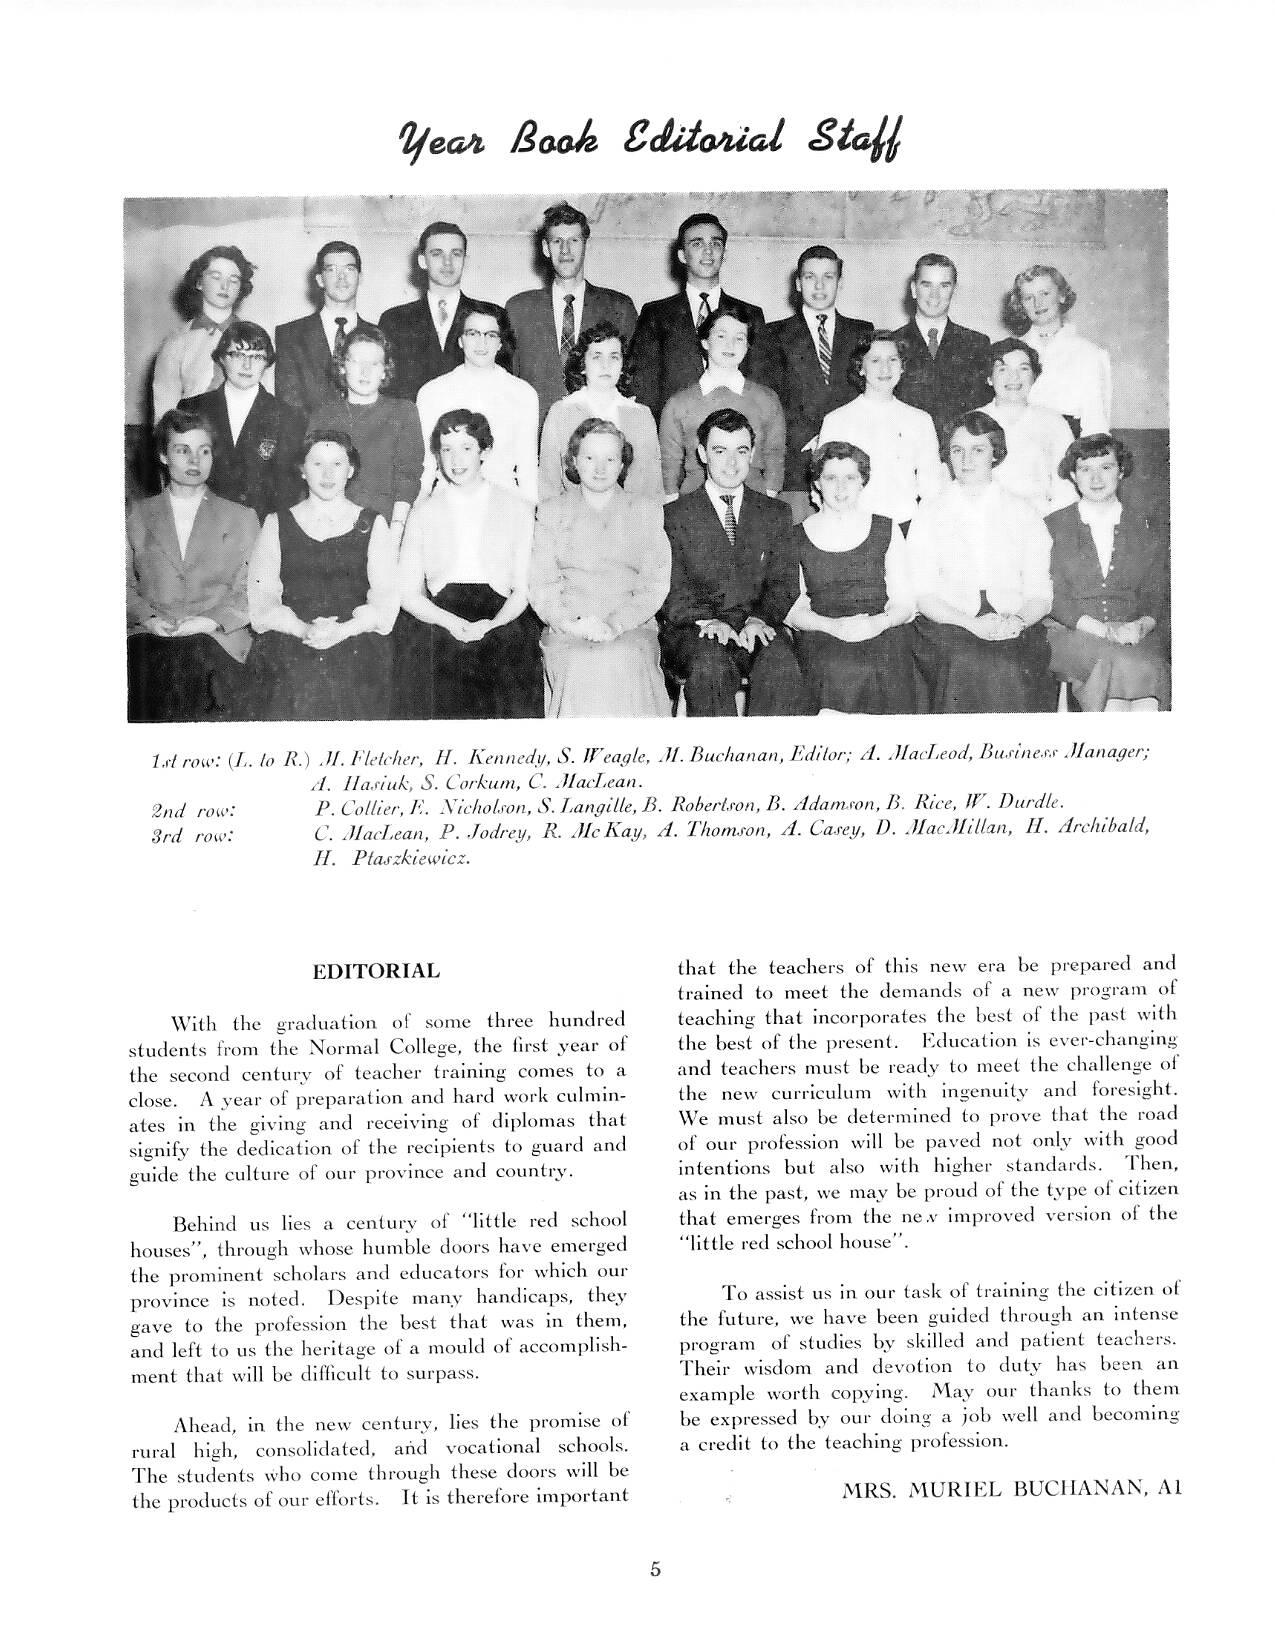 Little White School house Museum » 1956